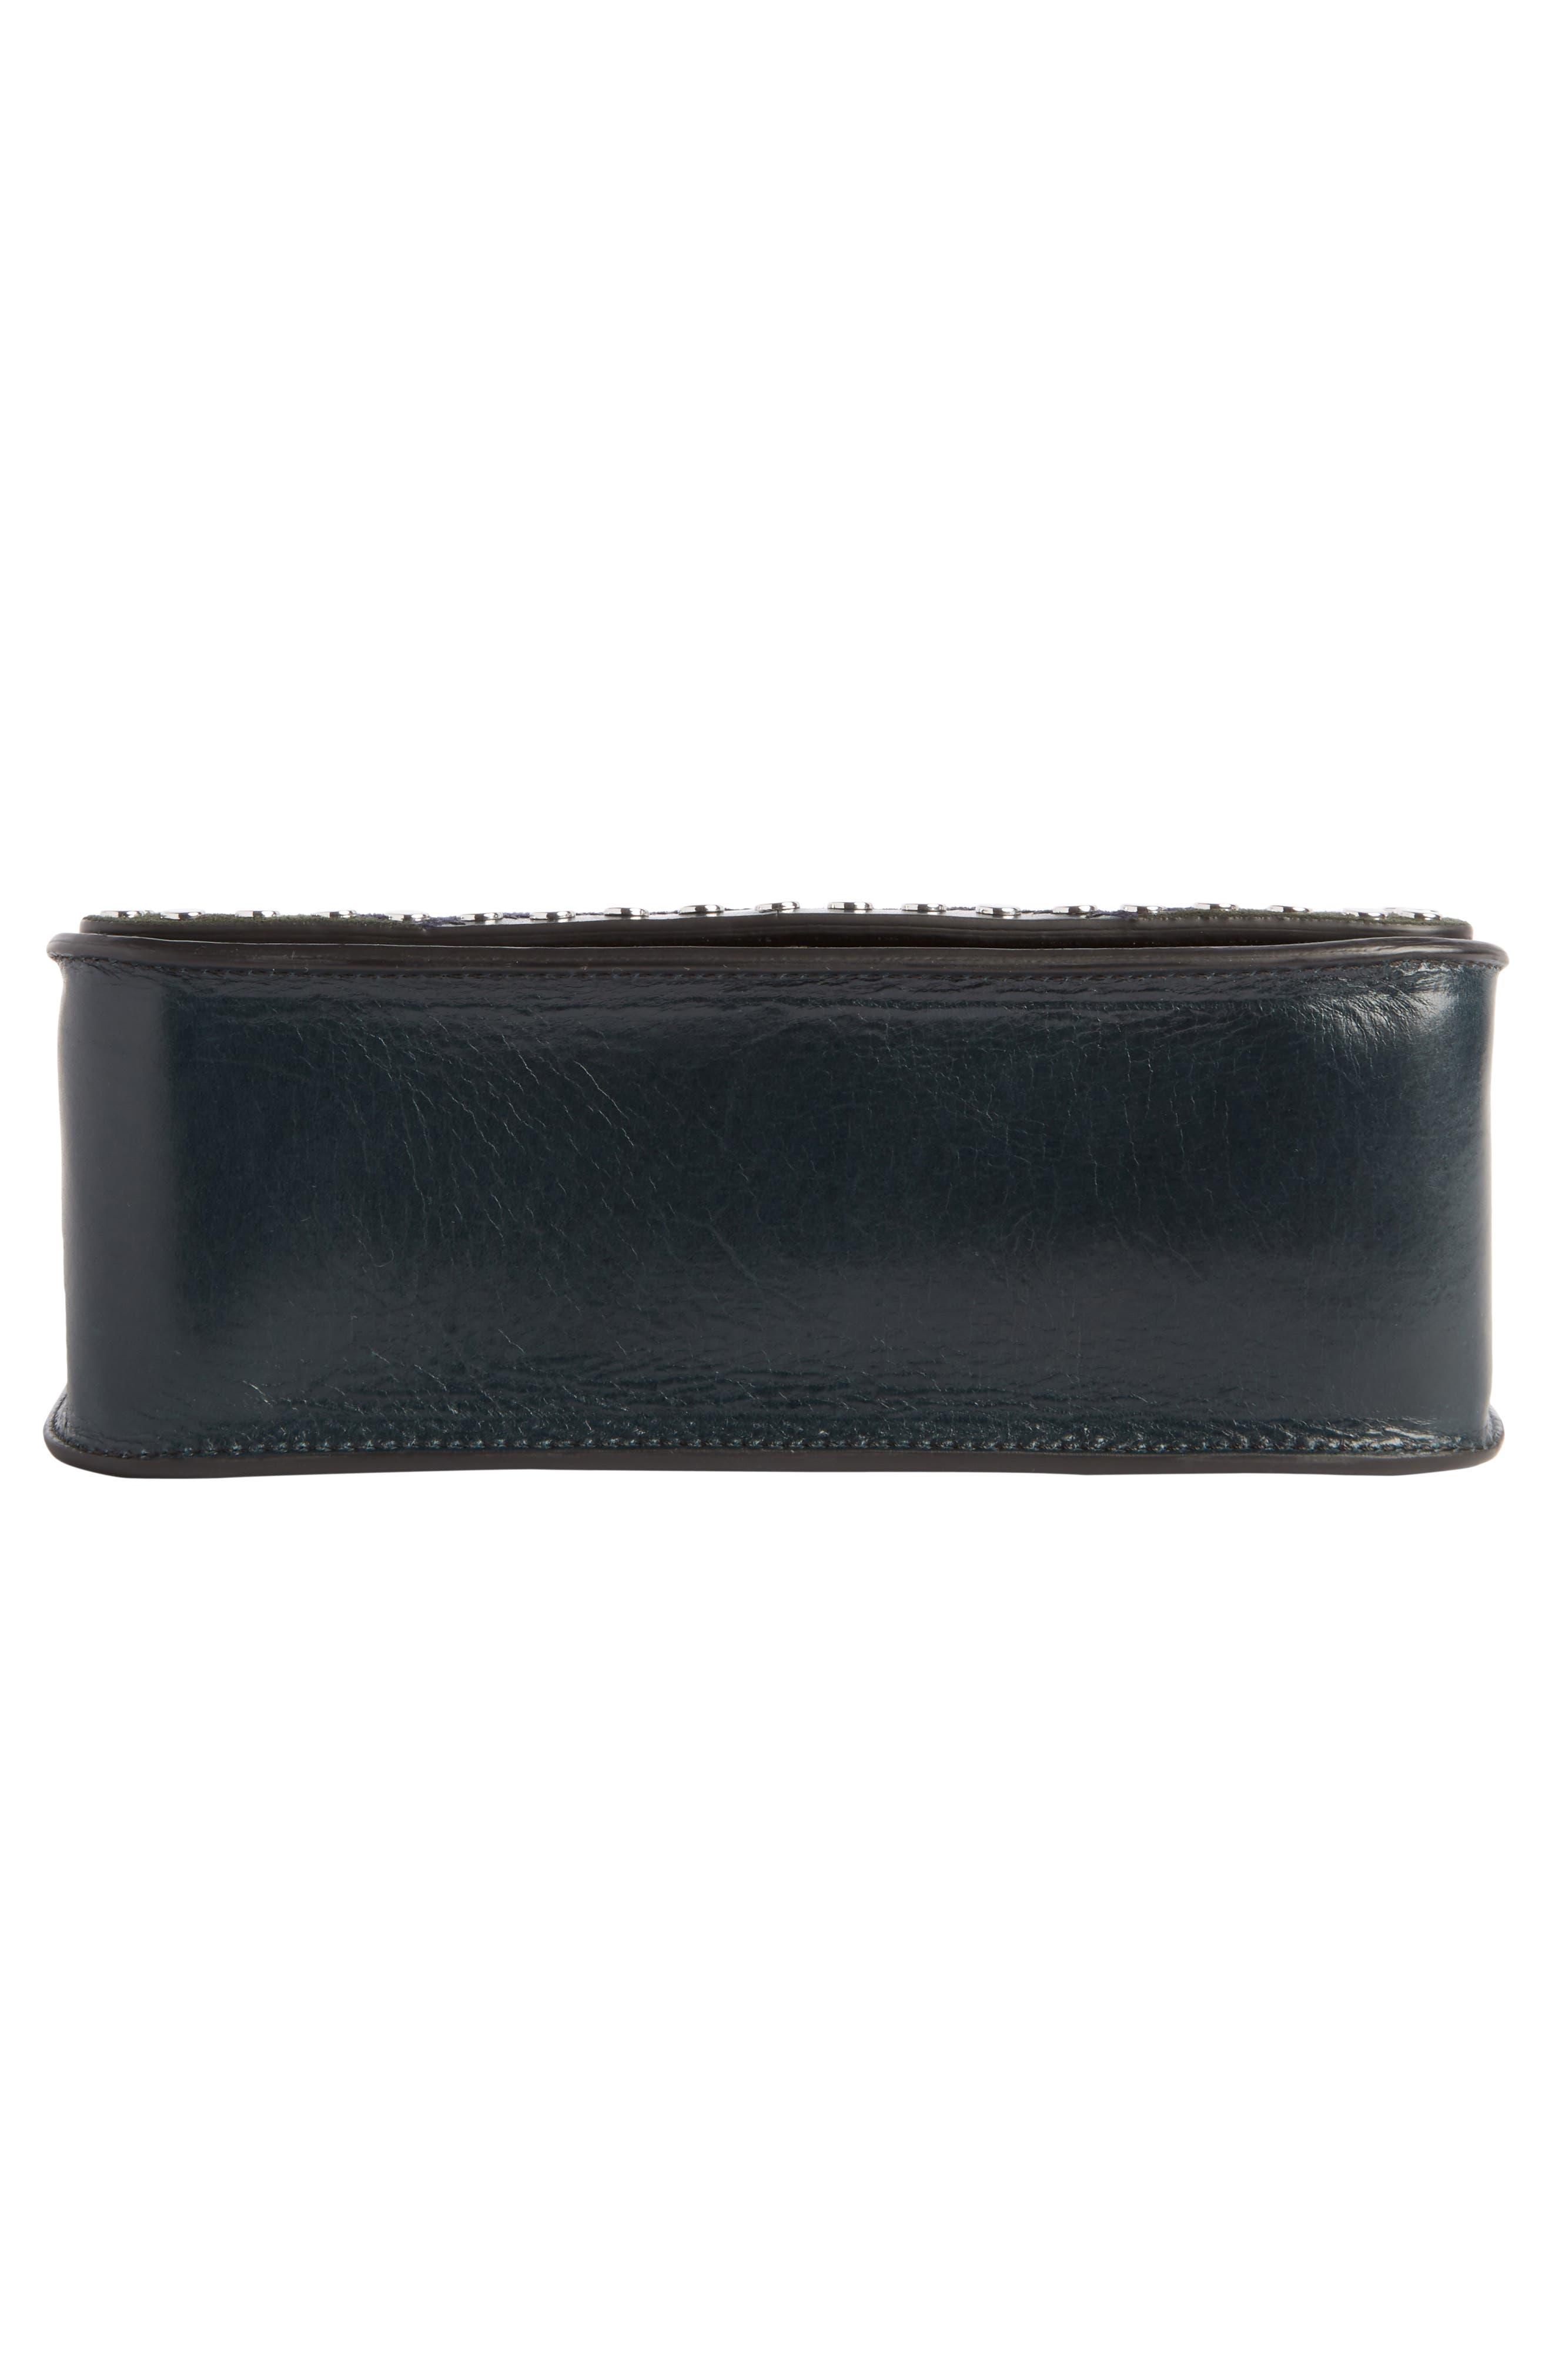 Calibar Patchwork Leather Crossbody Bag,                             Alternate thumbnail 4, color,                             Petrol